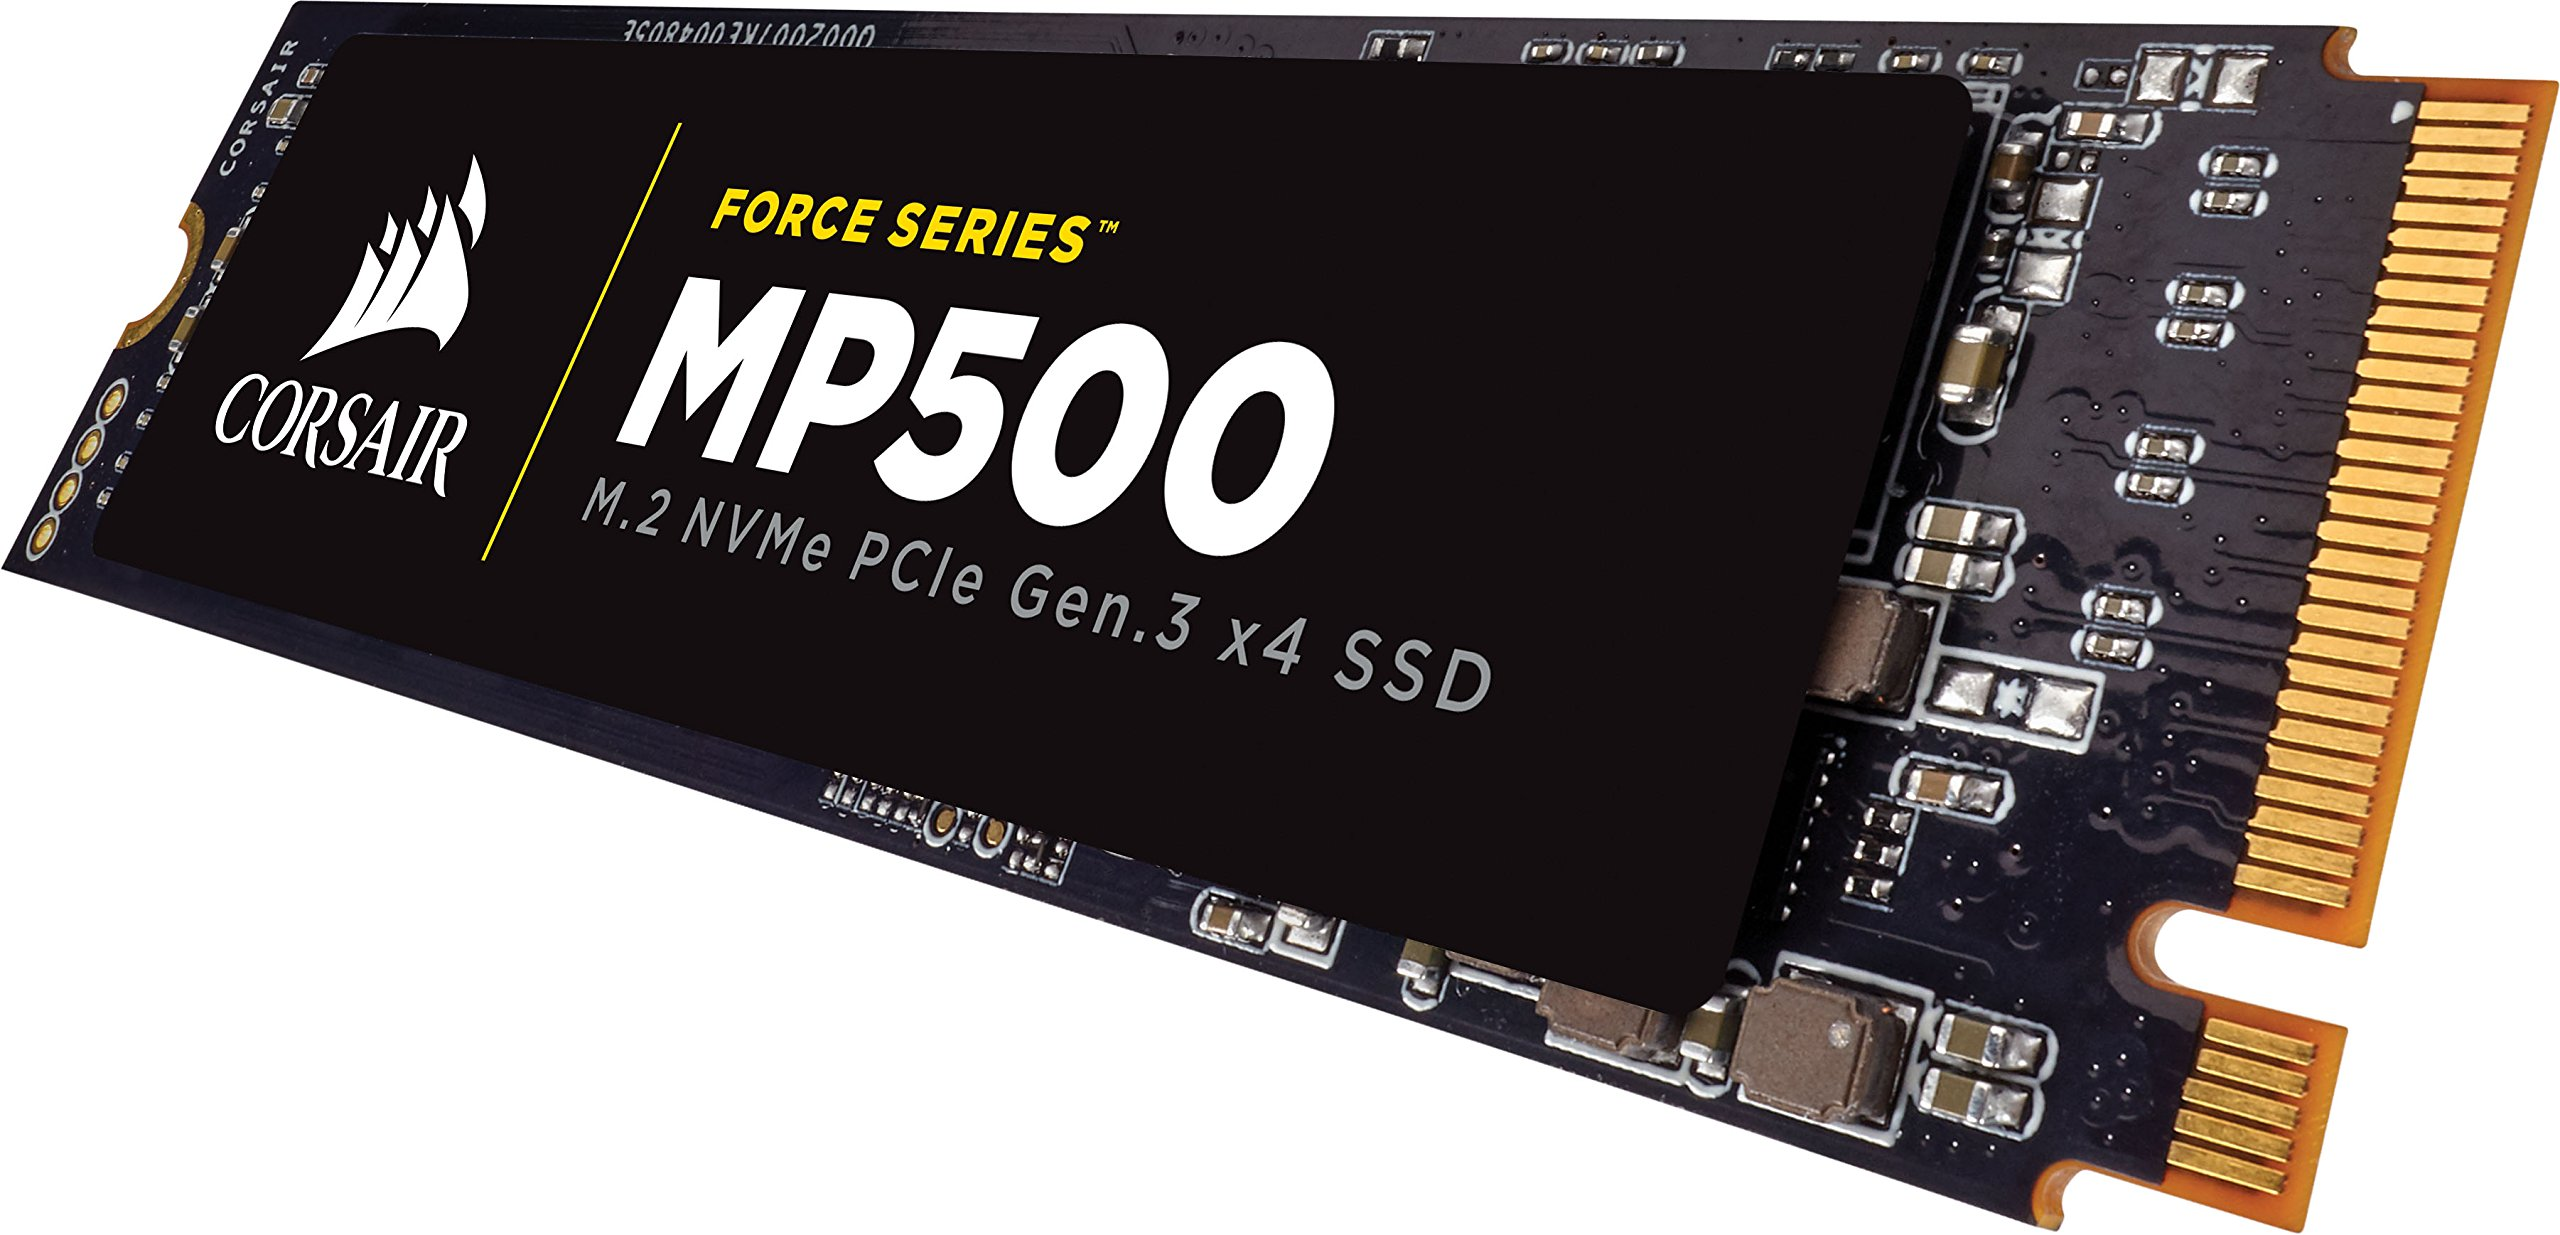 Corsair Force Series MP500 240GB M.2 NVMe PCIe Gen. 3 x4 SSD by Corsair (Image #3)